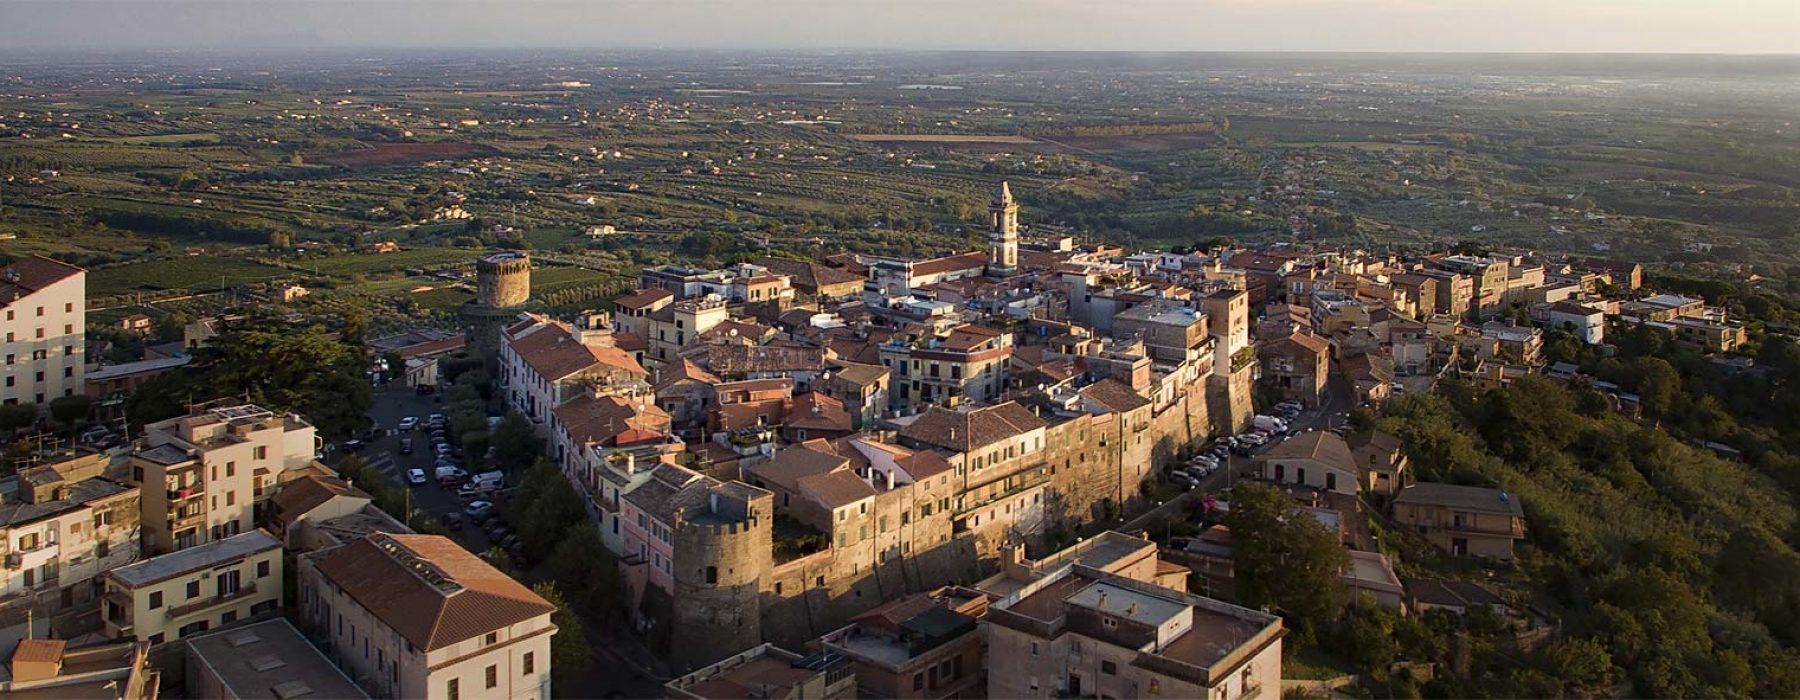 Lanuvio、Castelli Romaniの真珠、歴史が伝説と重なる場所